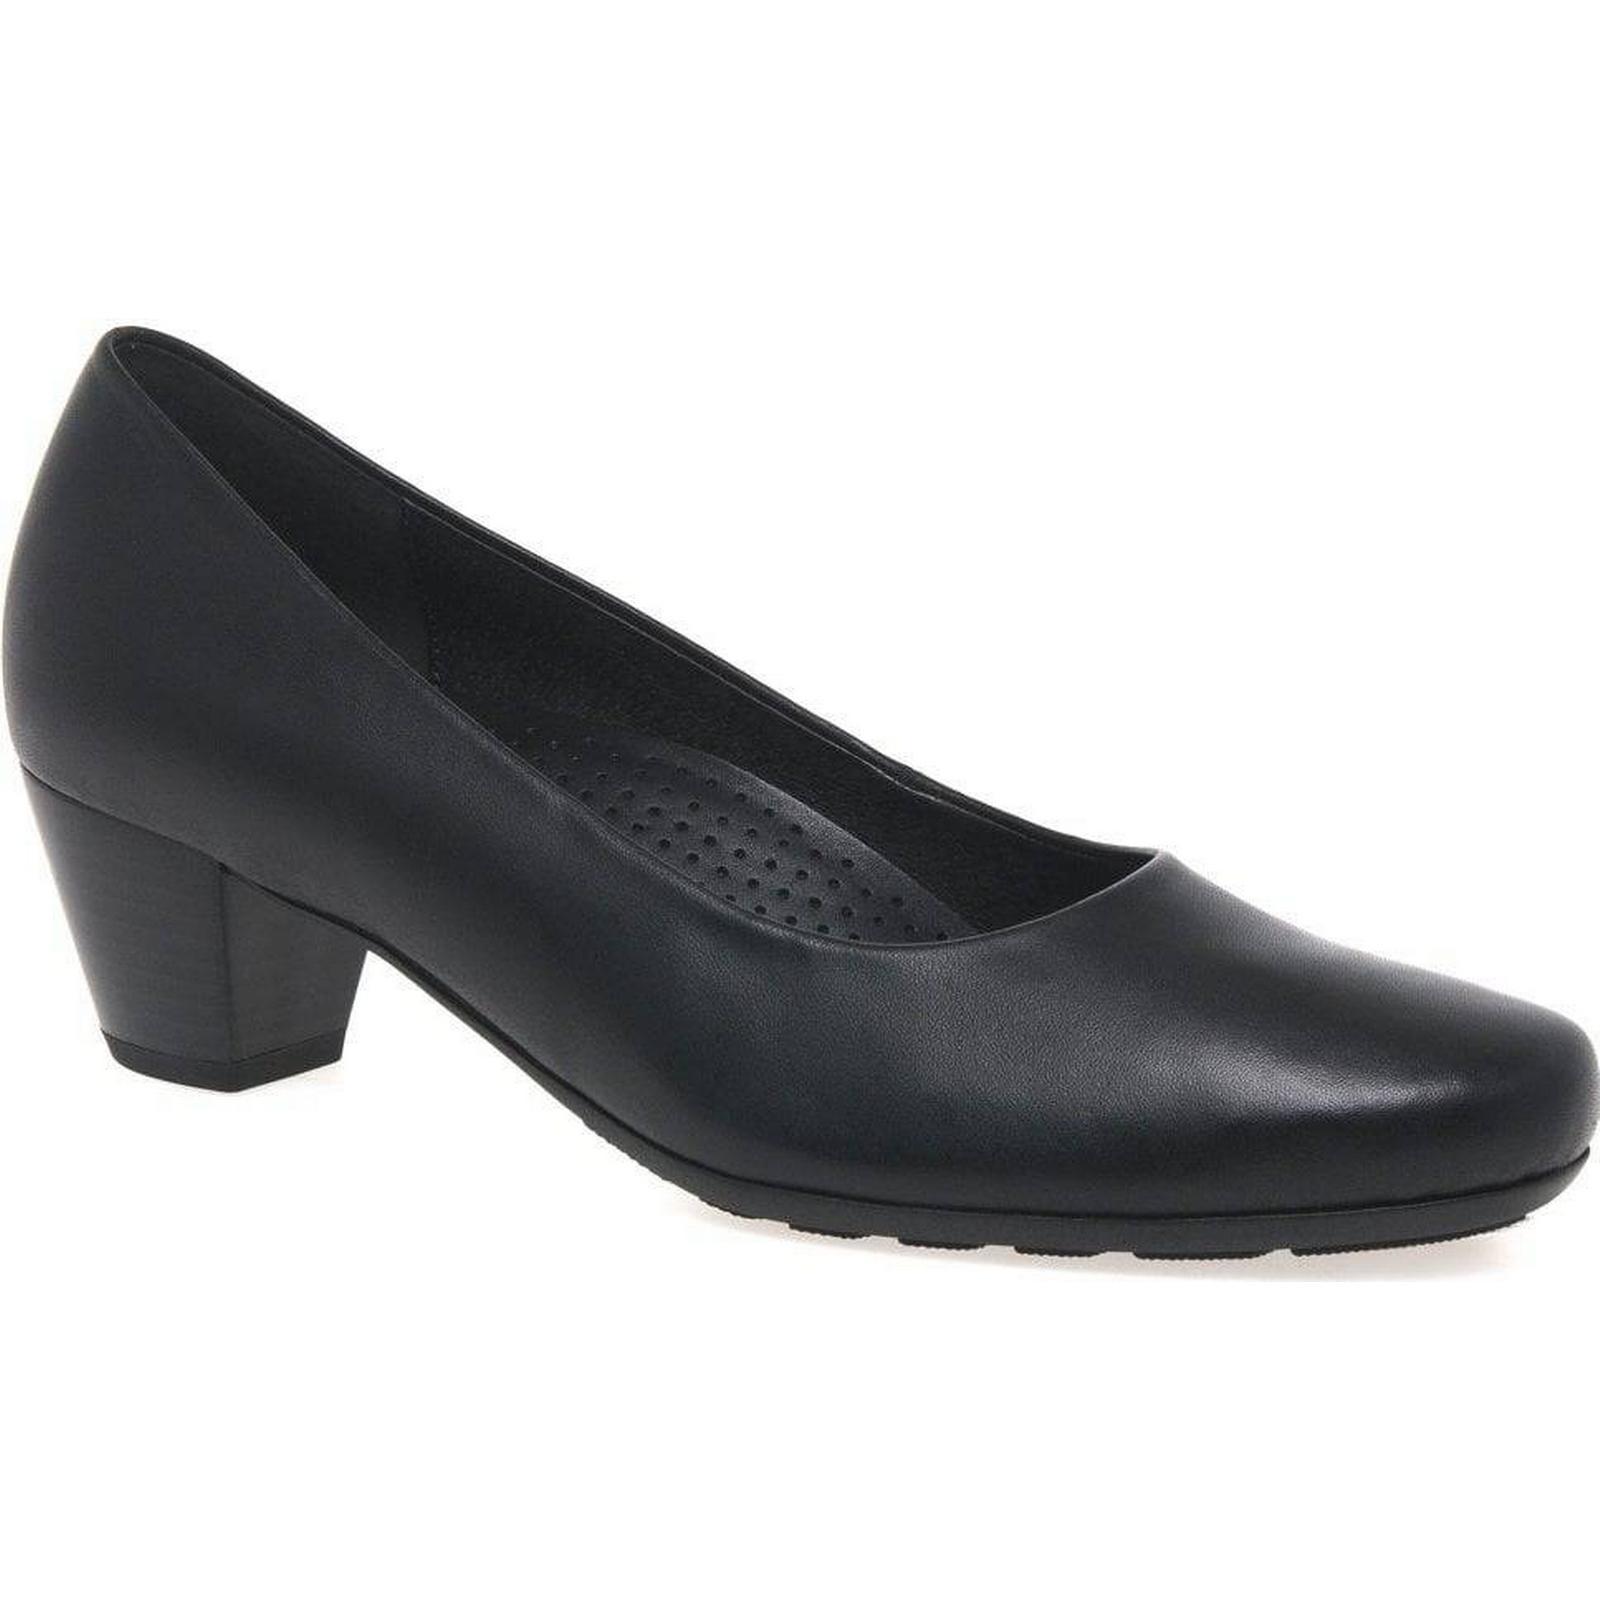 Gabor Brambling Black, Womens Court Shoes Colour: Black, Brambling Size: 7.5 435650